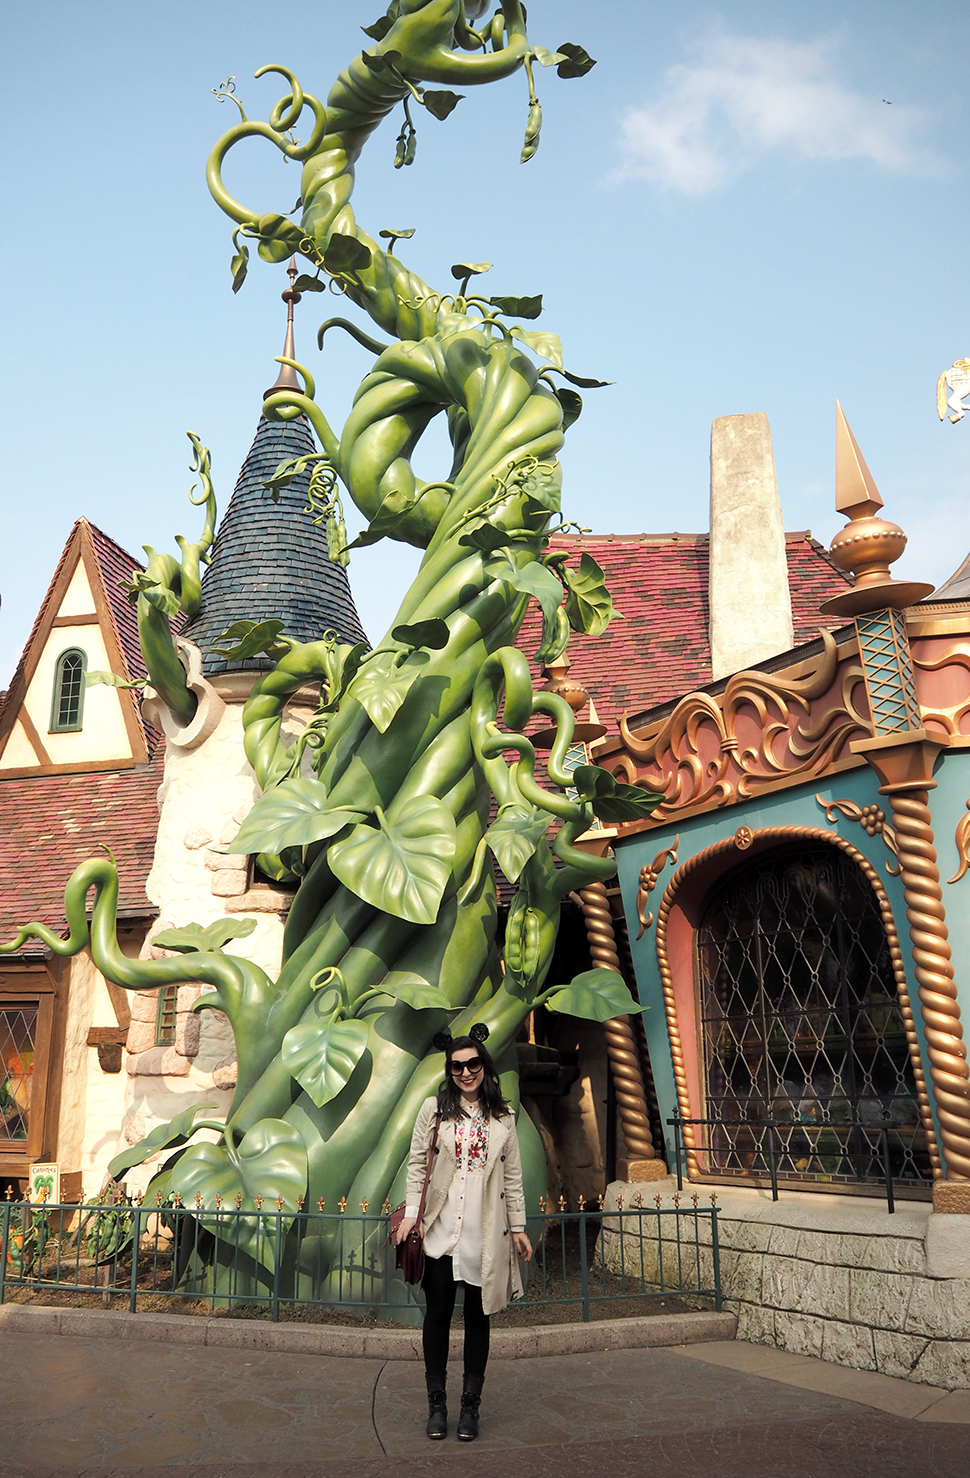 Helloitsvalentine_Disneyland_Spring_35